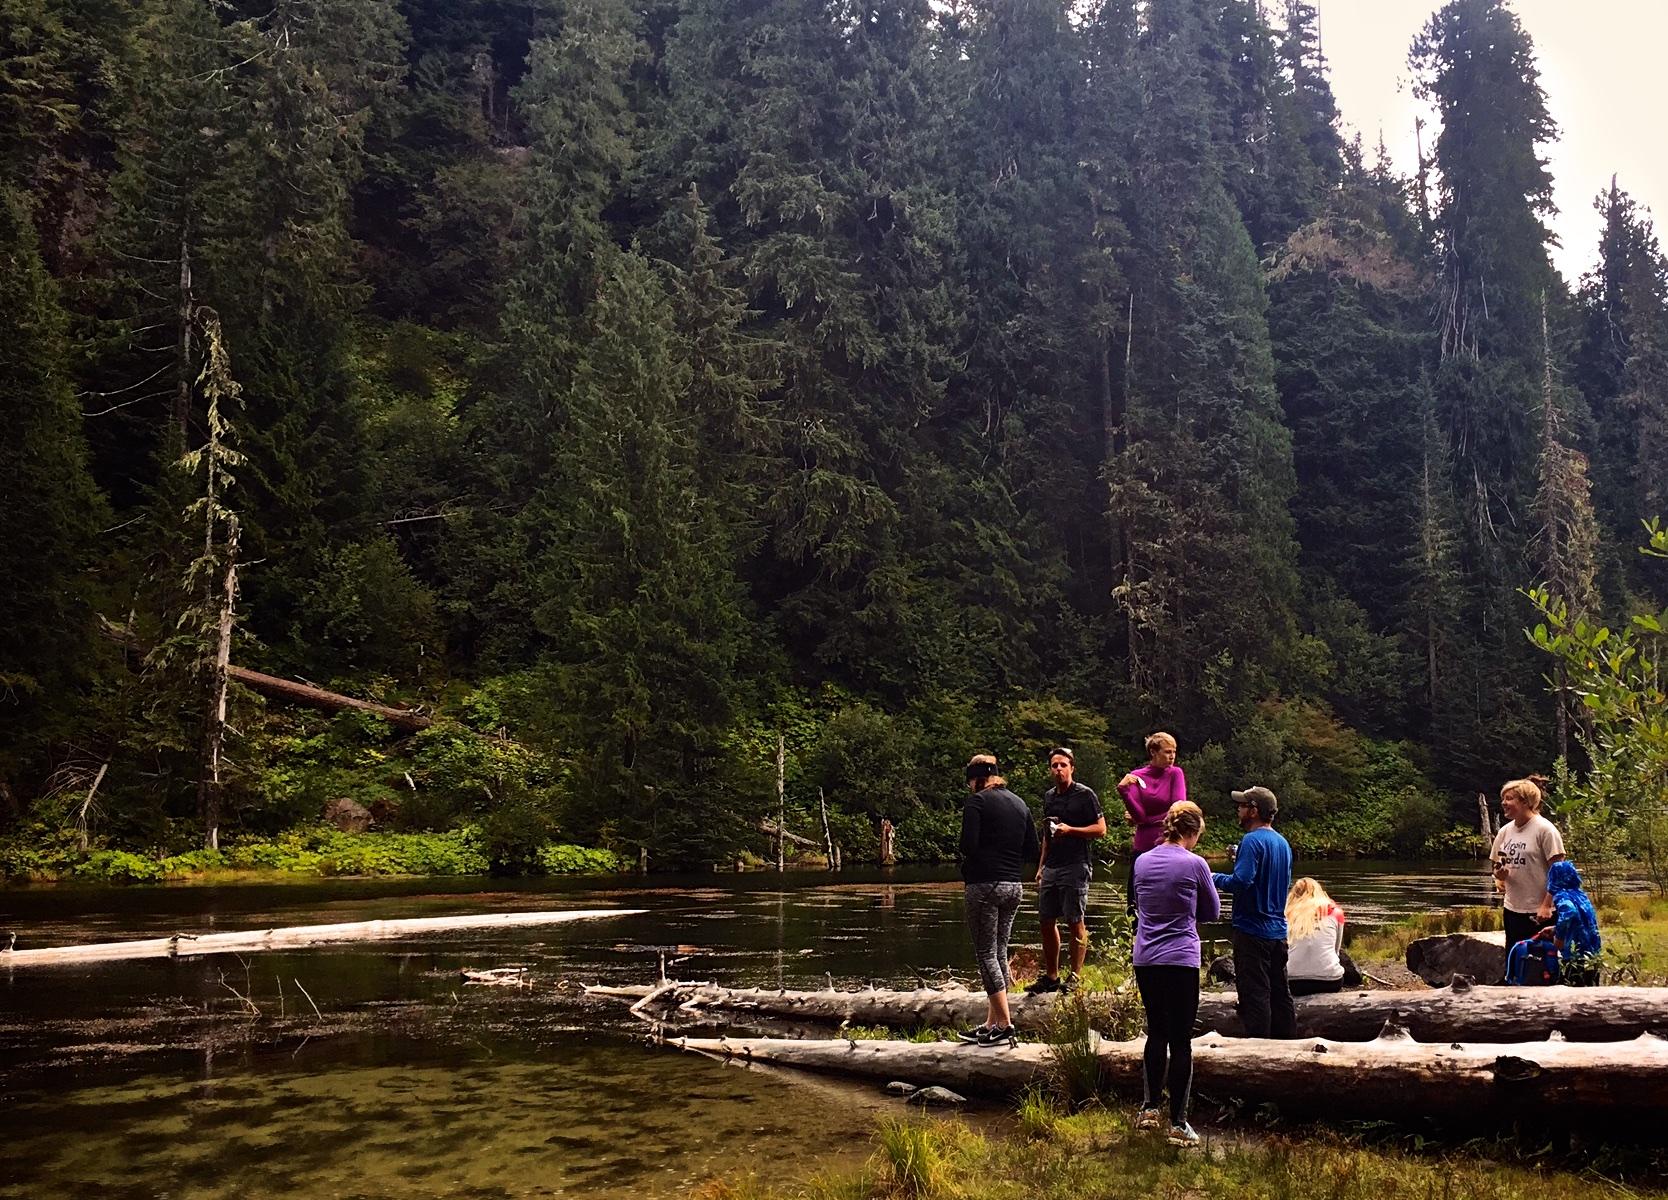 First stop, June Lake.